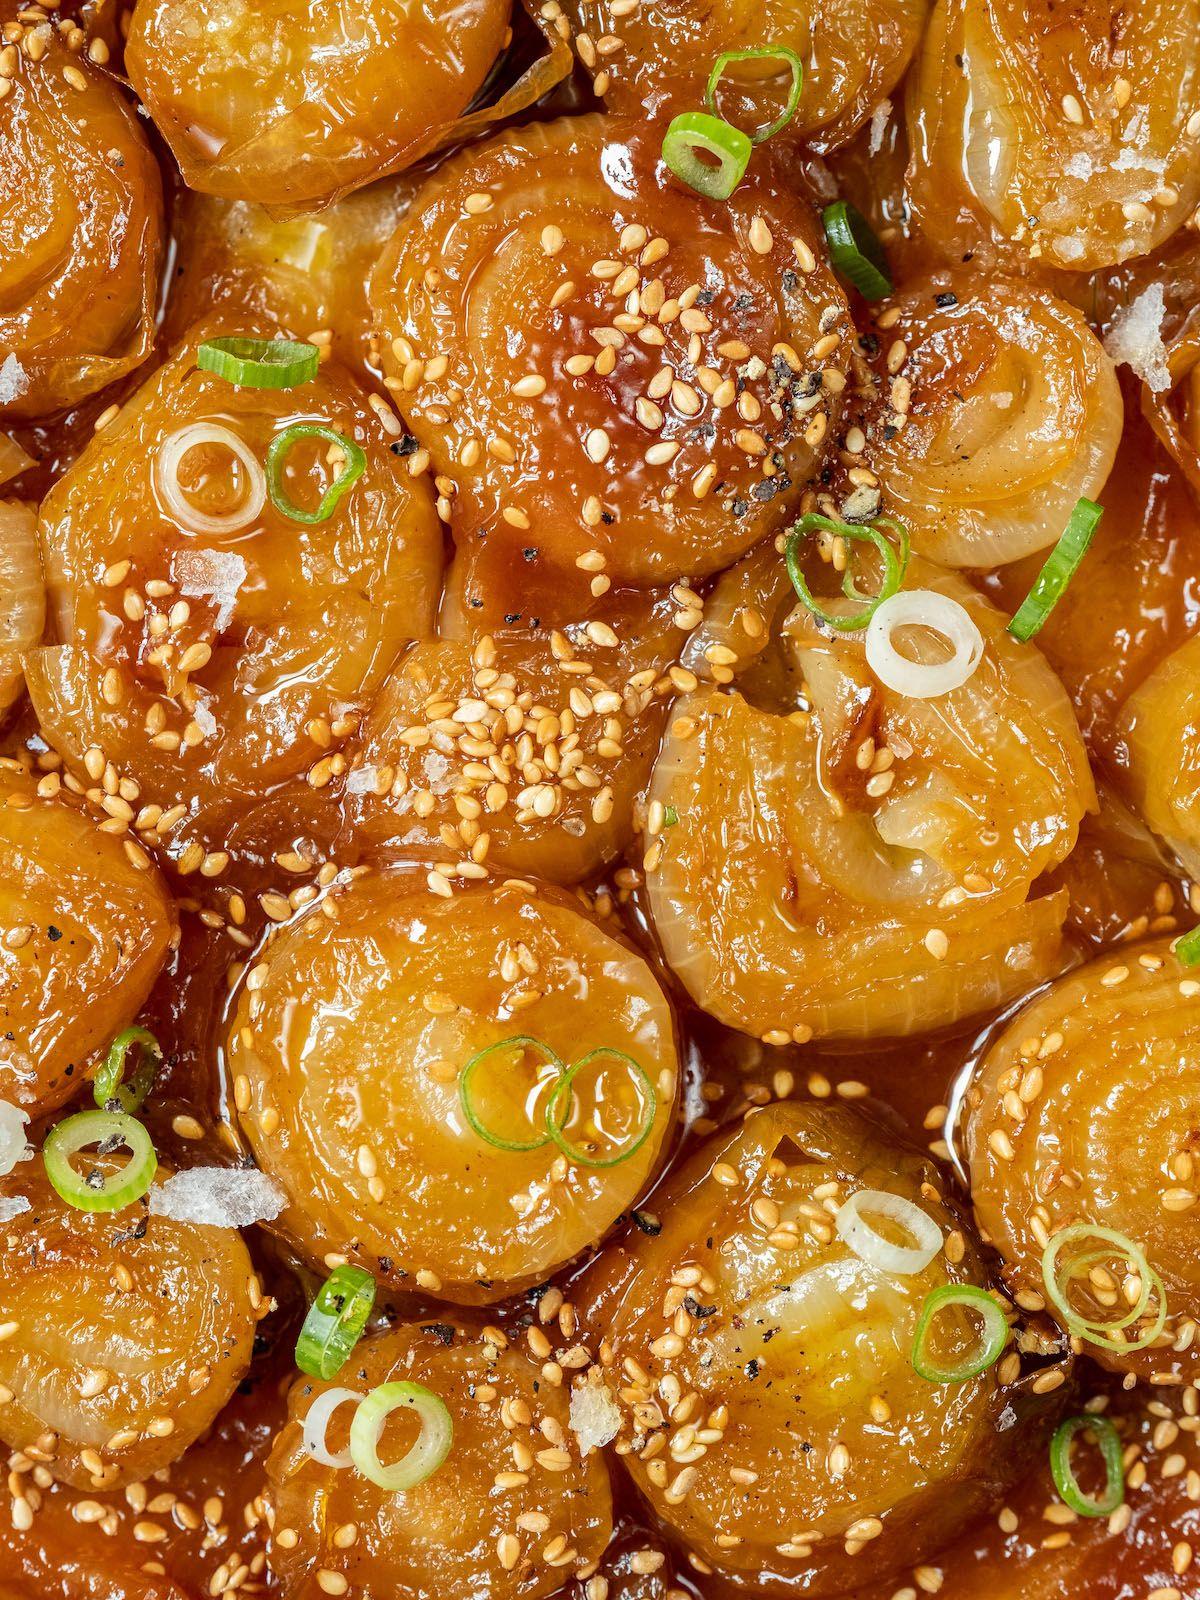 Rezept About Fuel Foodblog Zwiebel Tart Tatin mit Miso, Sesam und Frühlingszwiebeln